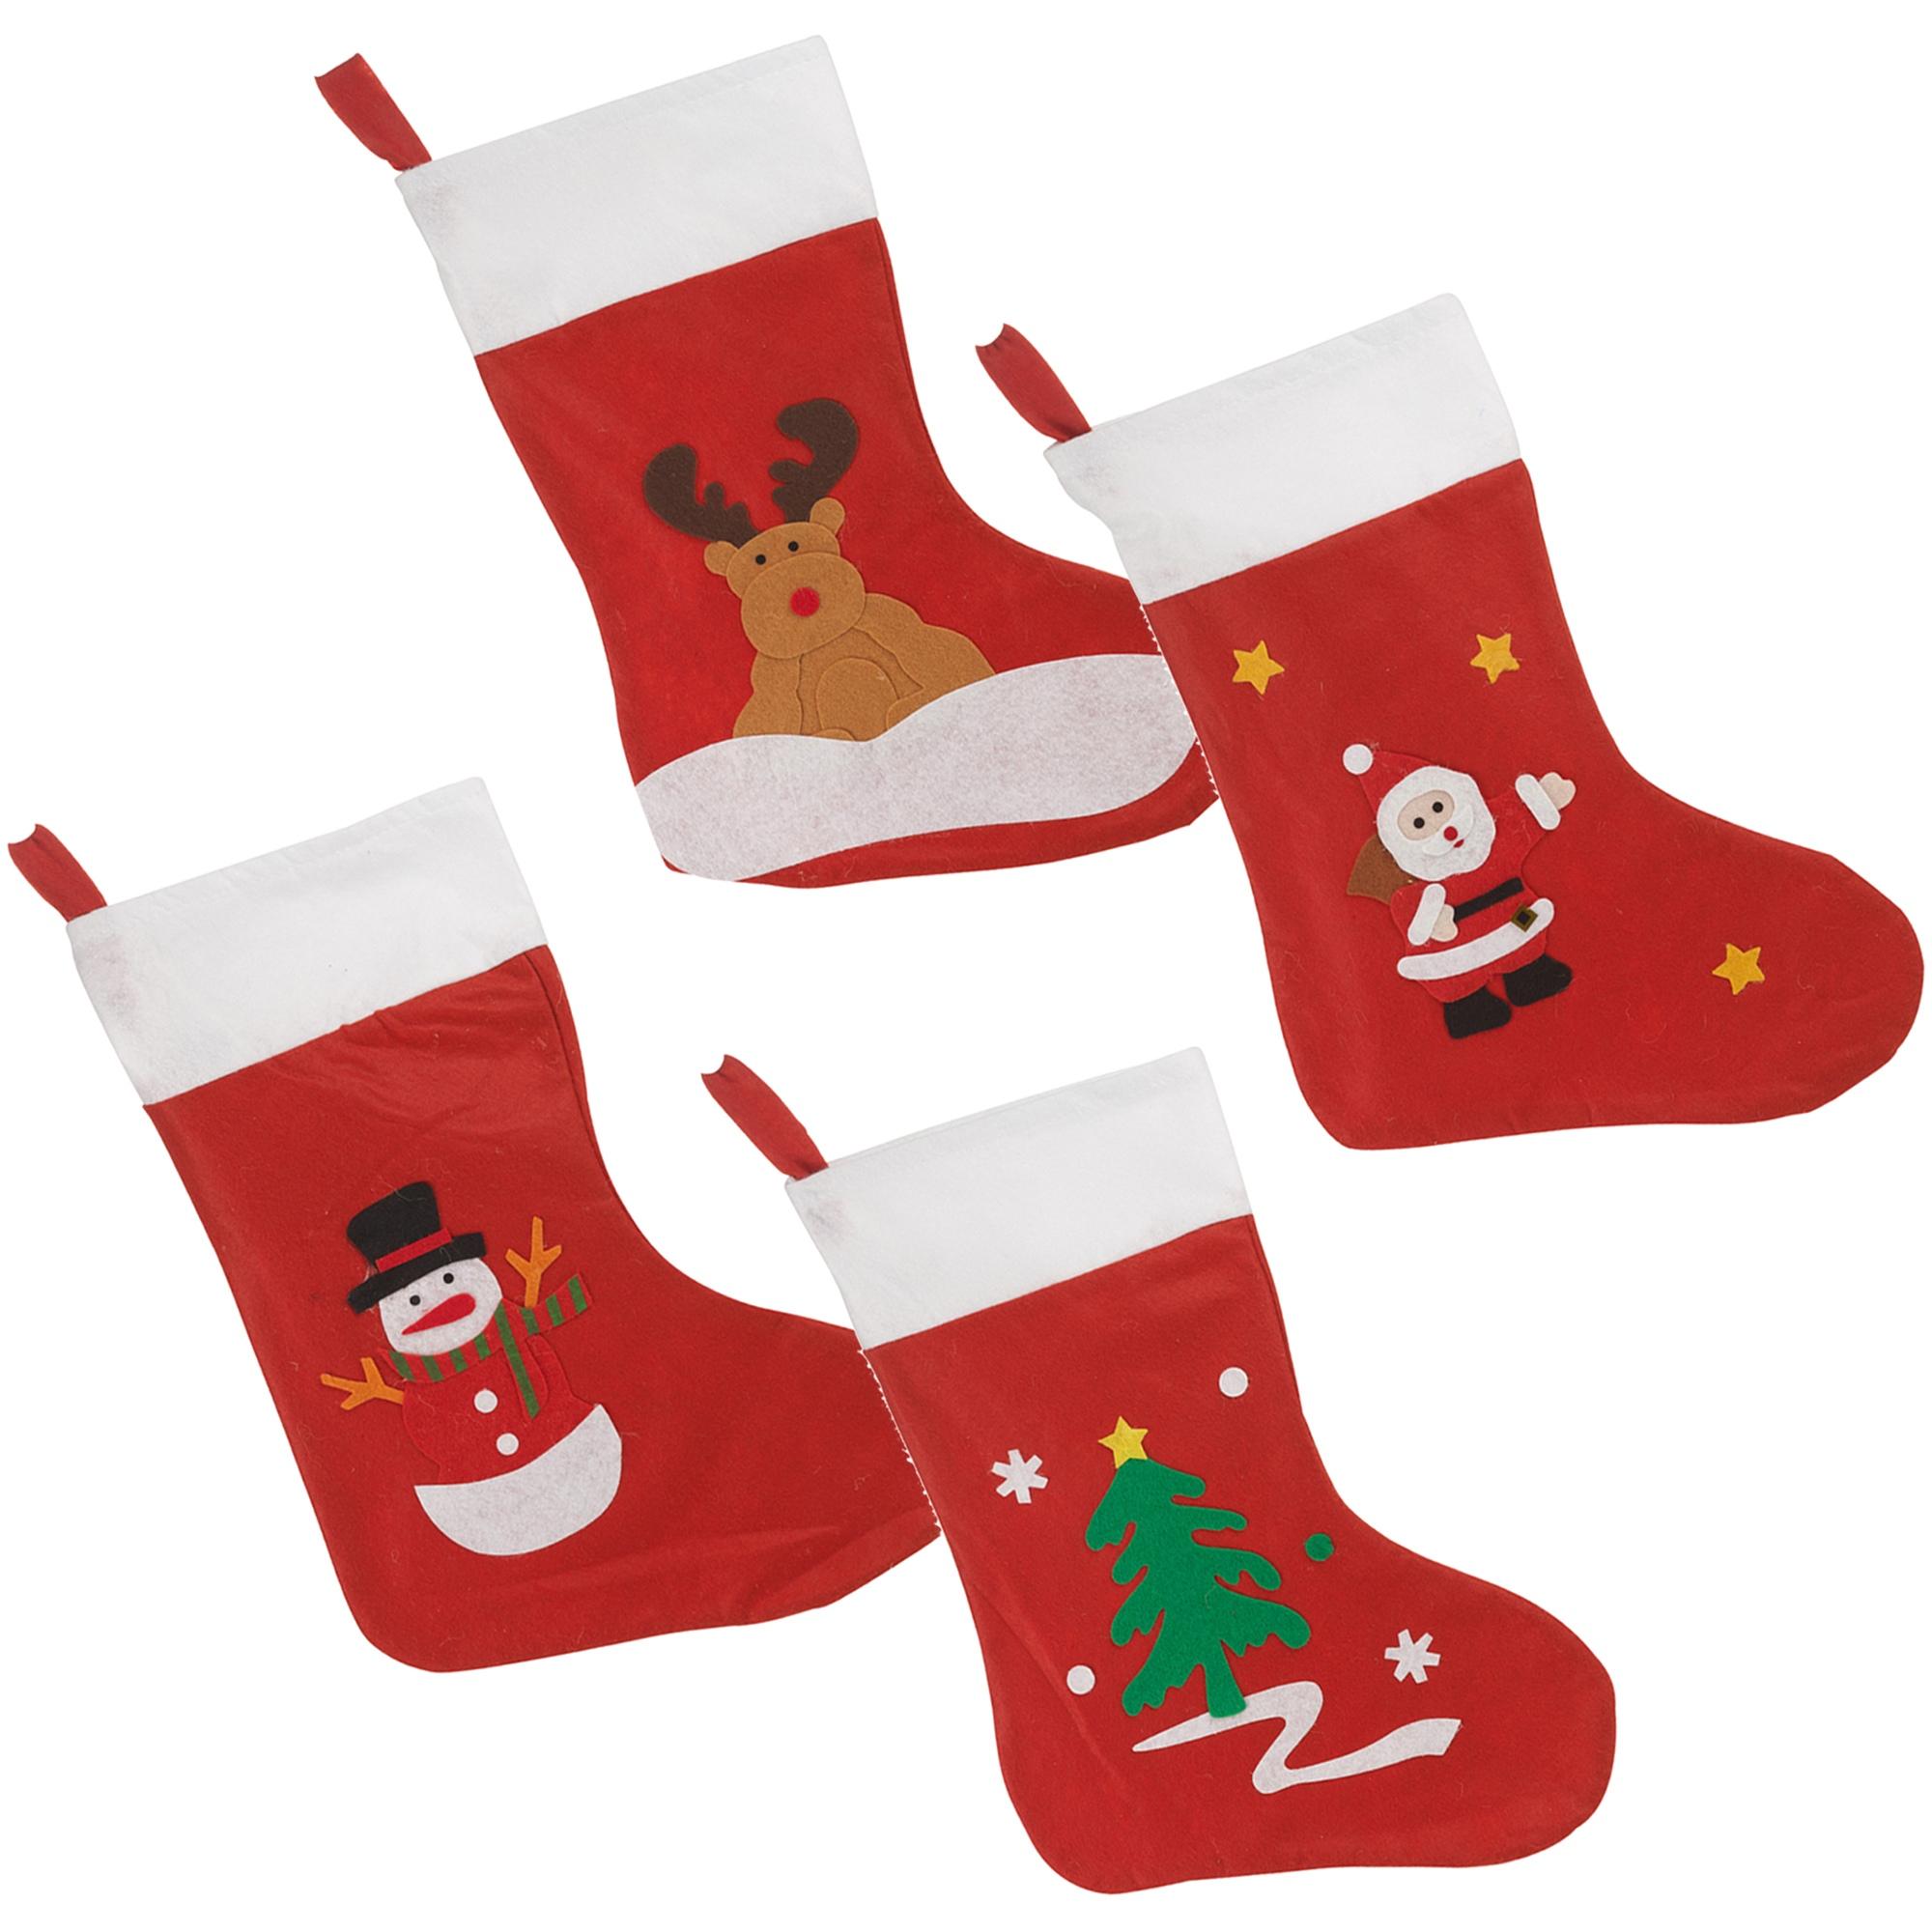 Details About Christmas Santa Tree Snowman Soft Stockings Socks Gift Bag Sack Xmas Presents